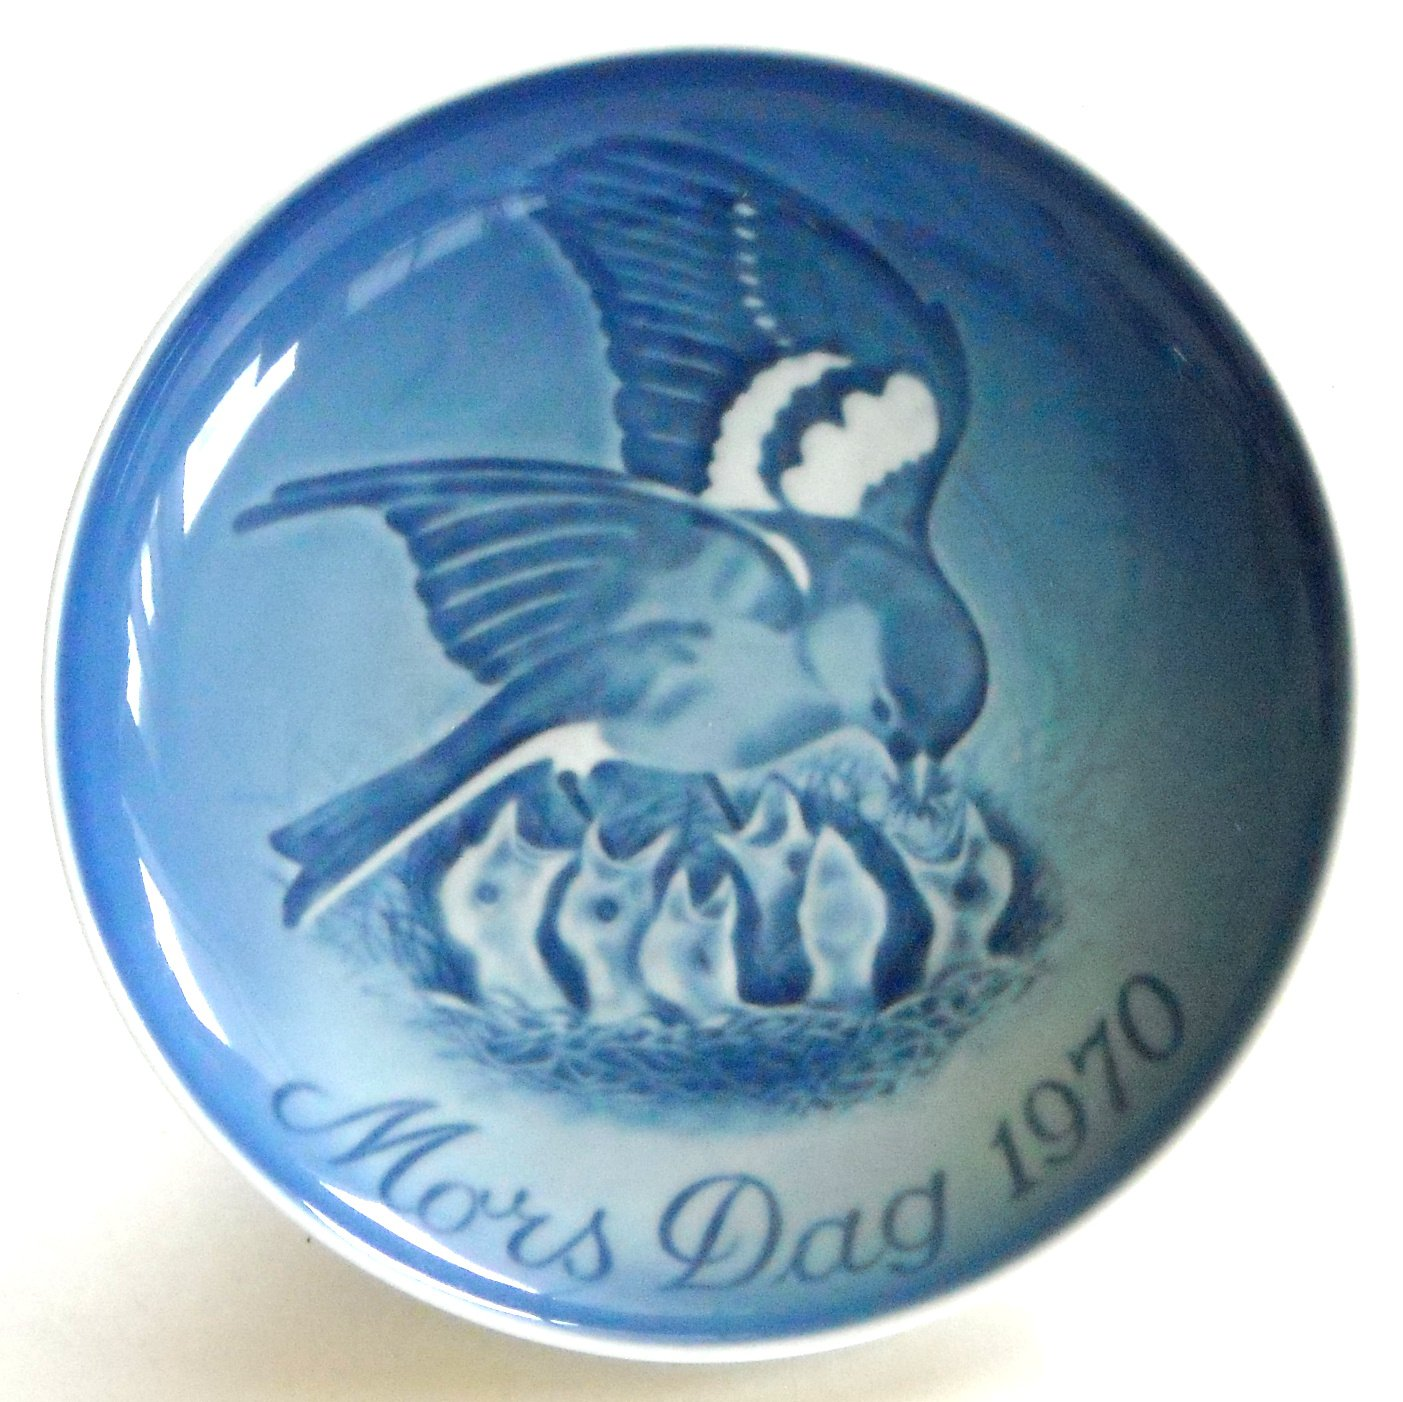 Bing & Grondahl Denmark Sparrow Chicks Mothers Day Plate 1970